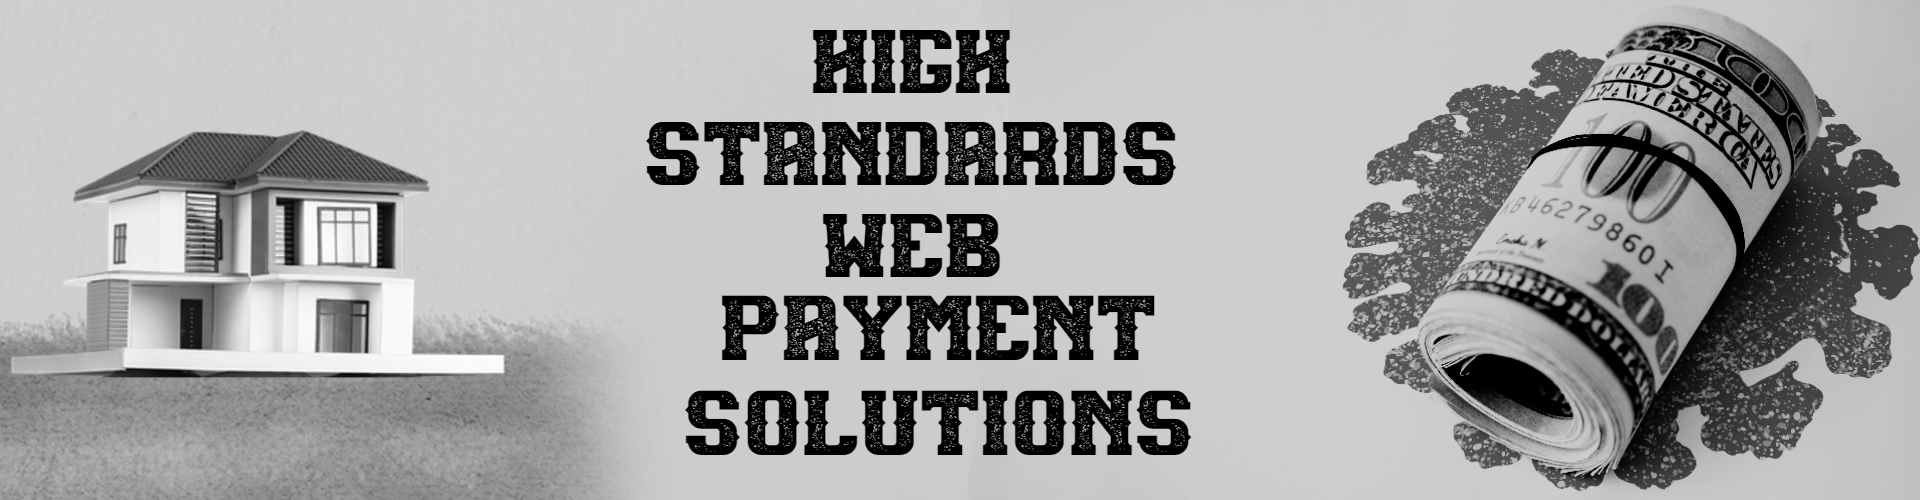 PAYMENT-SOLUTIONS-HIGHSTANDARDSWEB